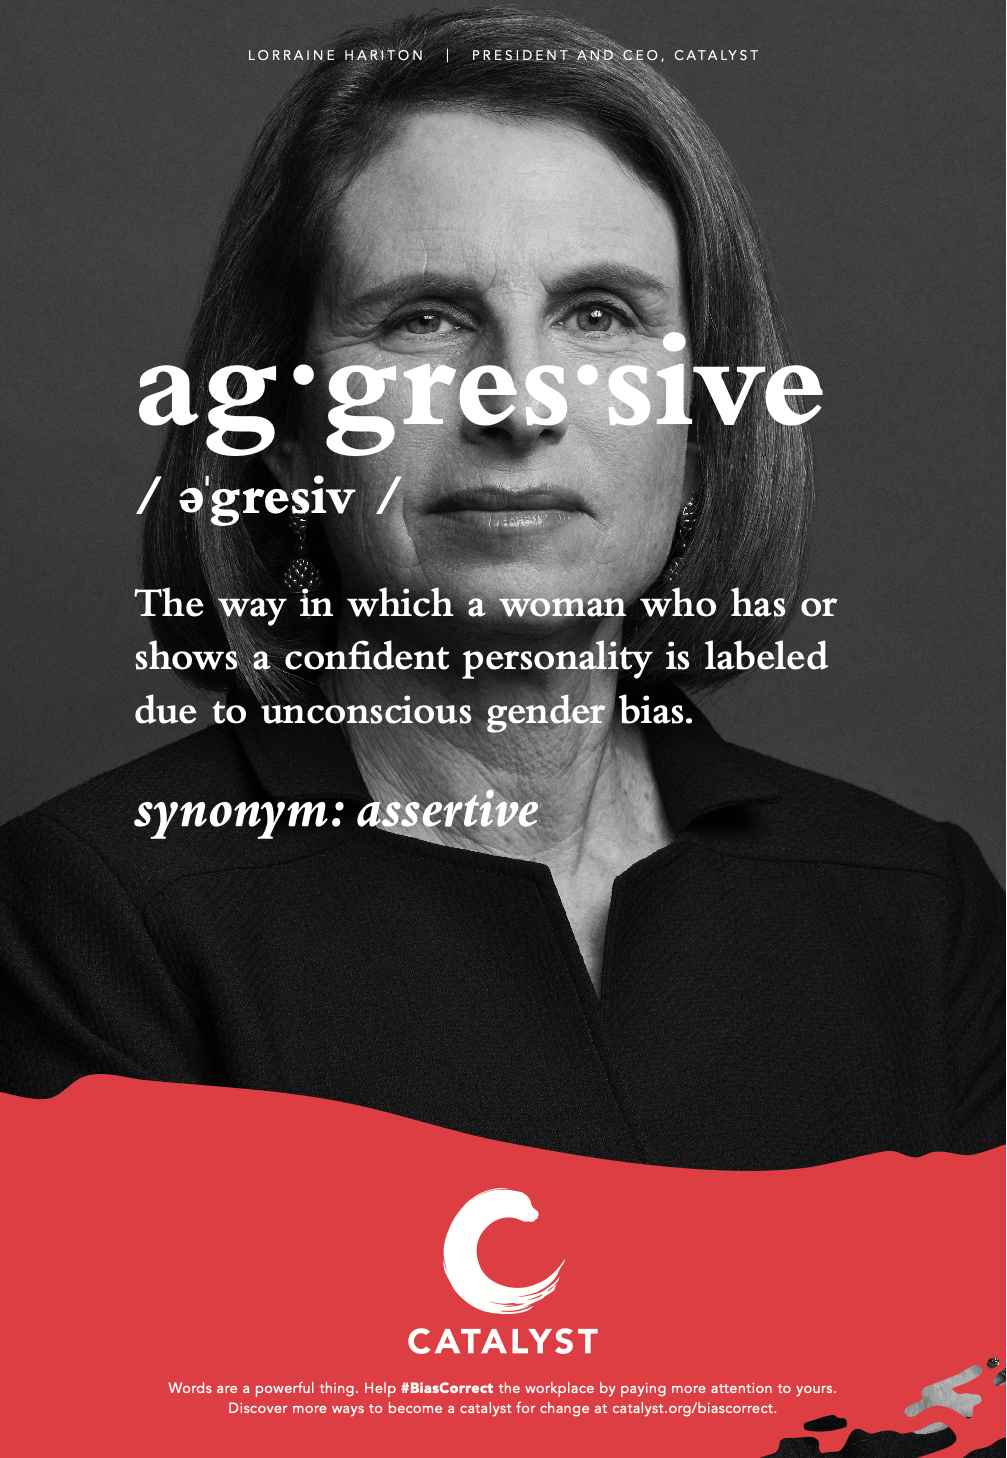 gender bias in the workplace